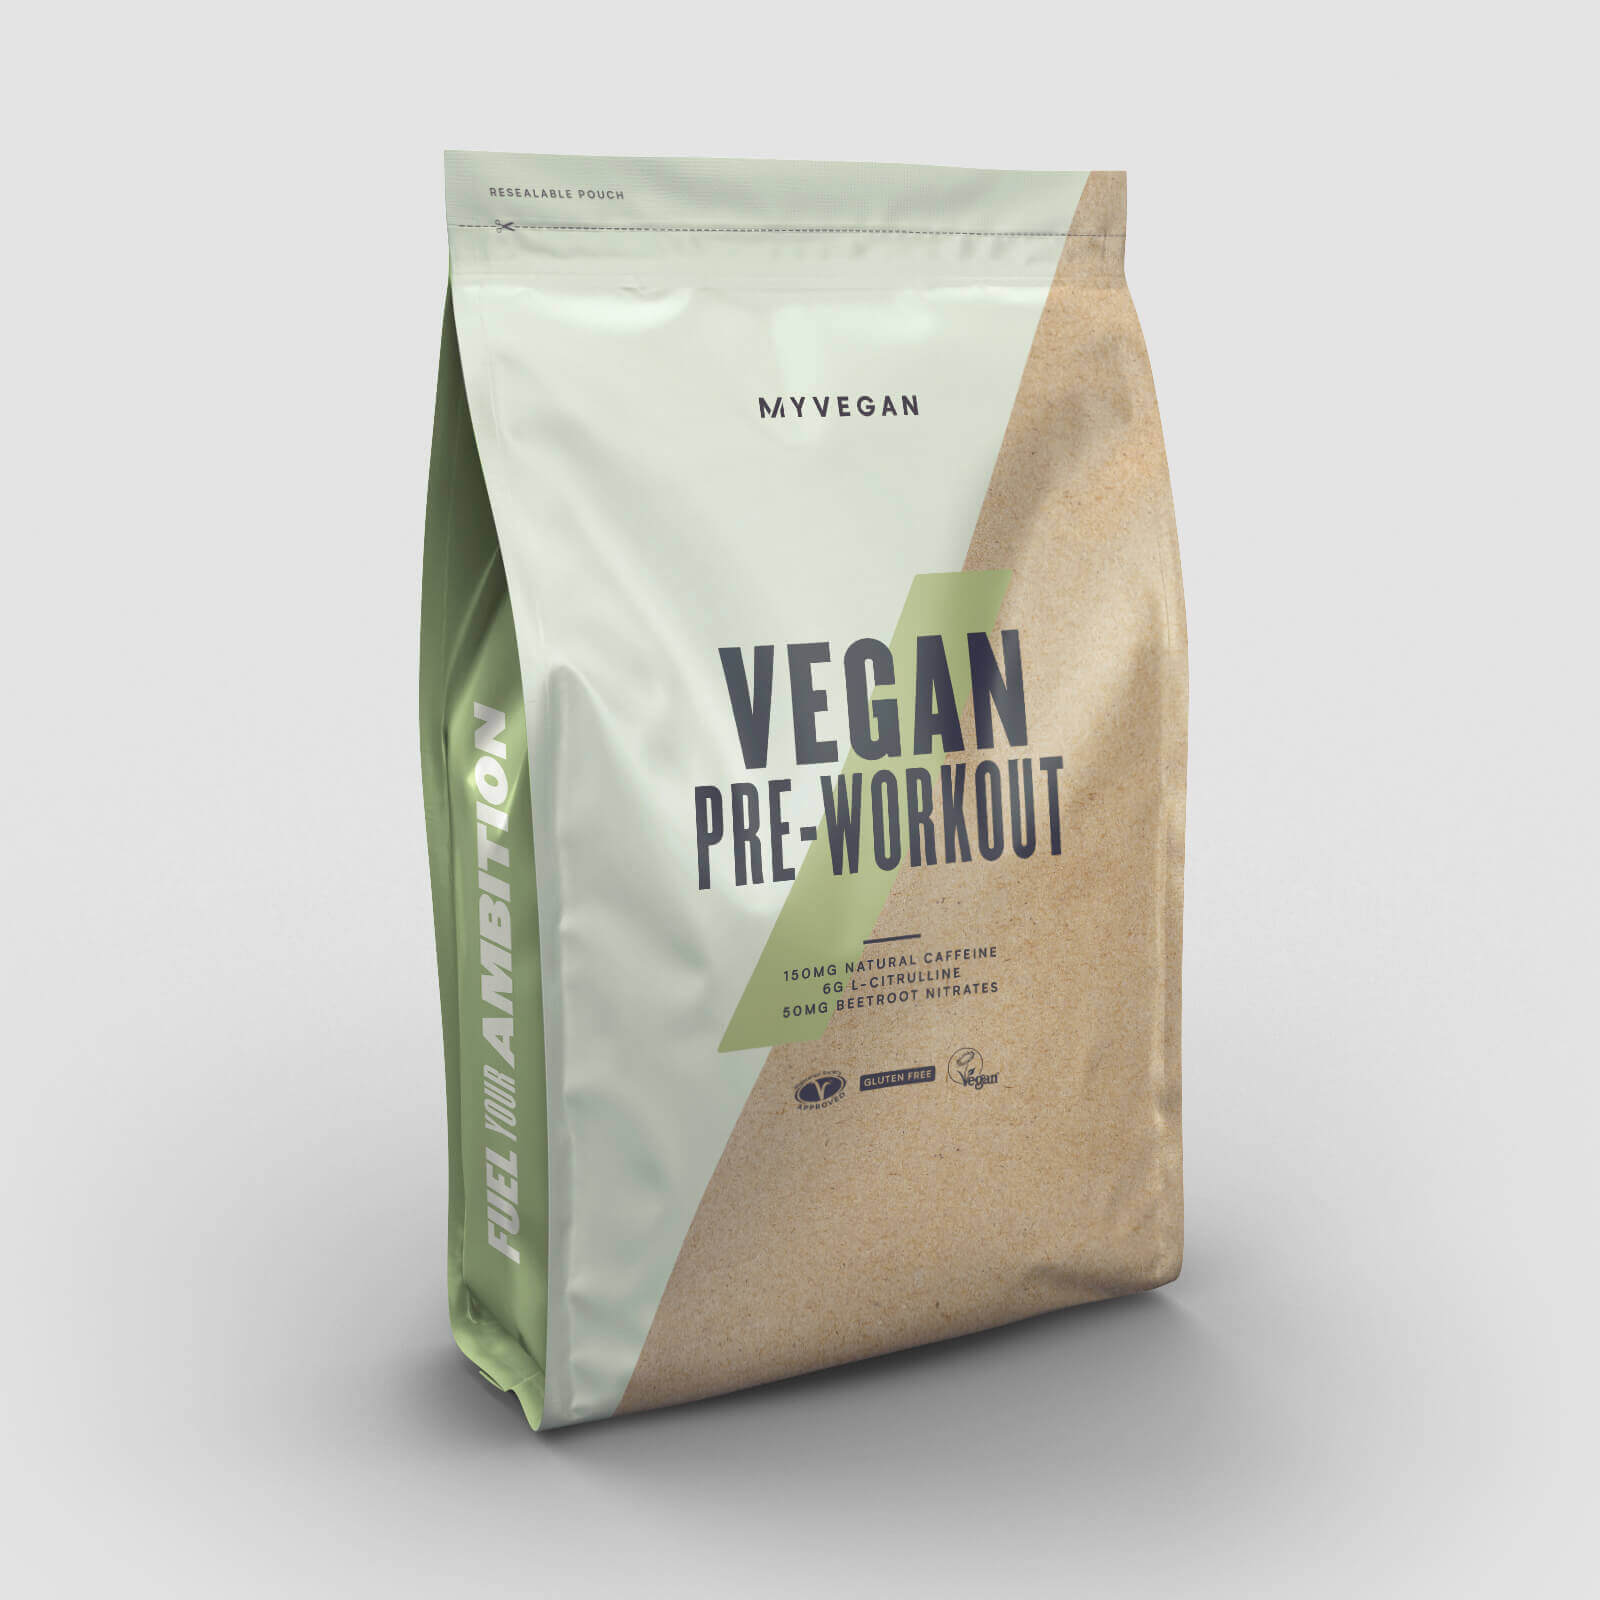 Beste vegan pre-workout